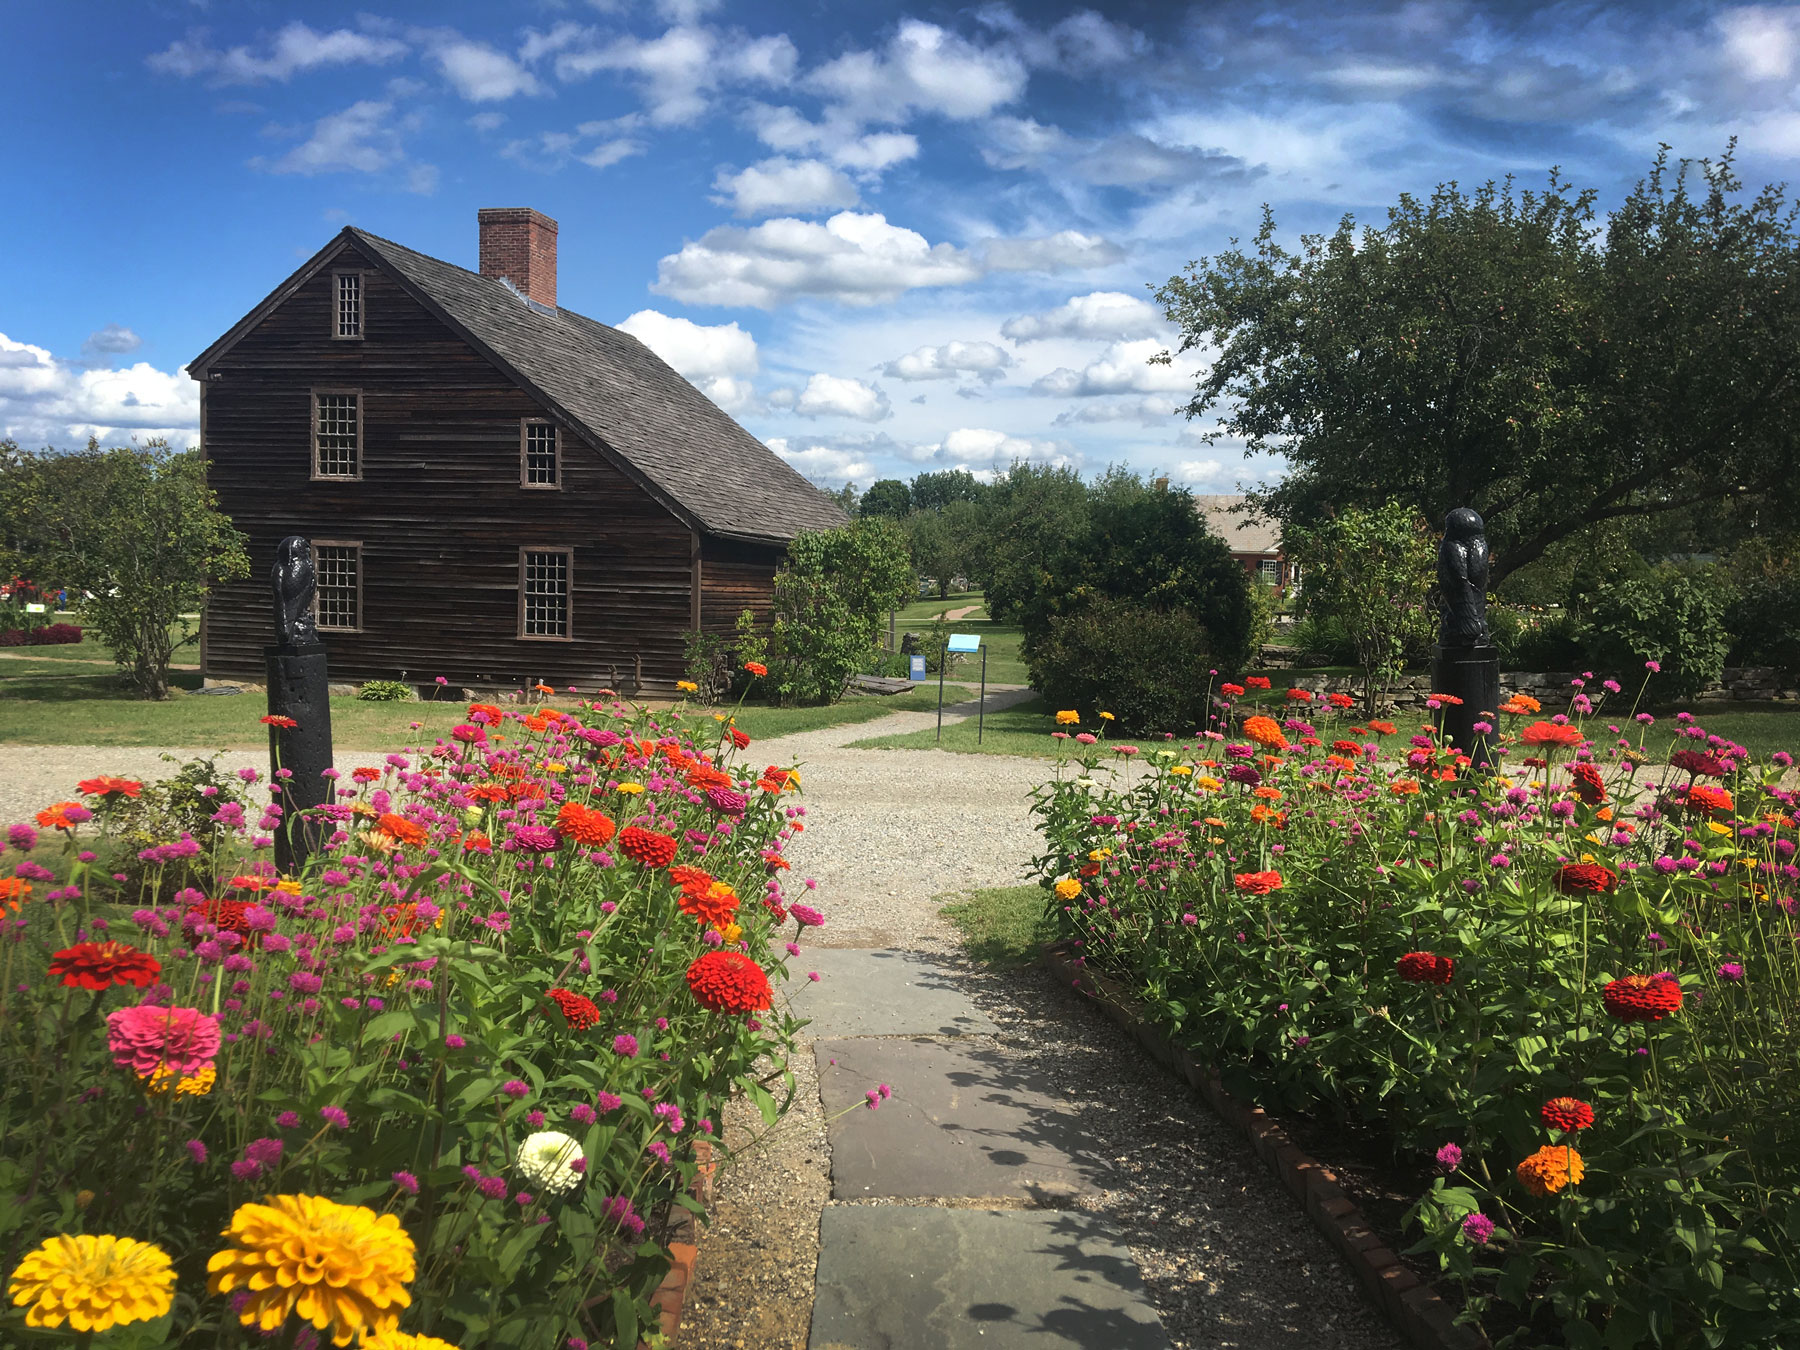 Zinnia flower garden at the Shelburne Museum in Vermont.